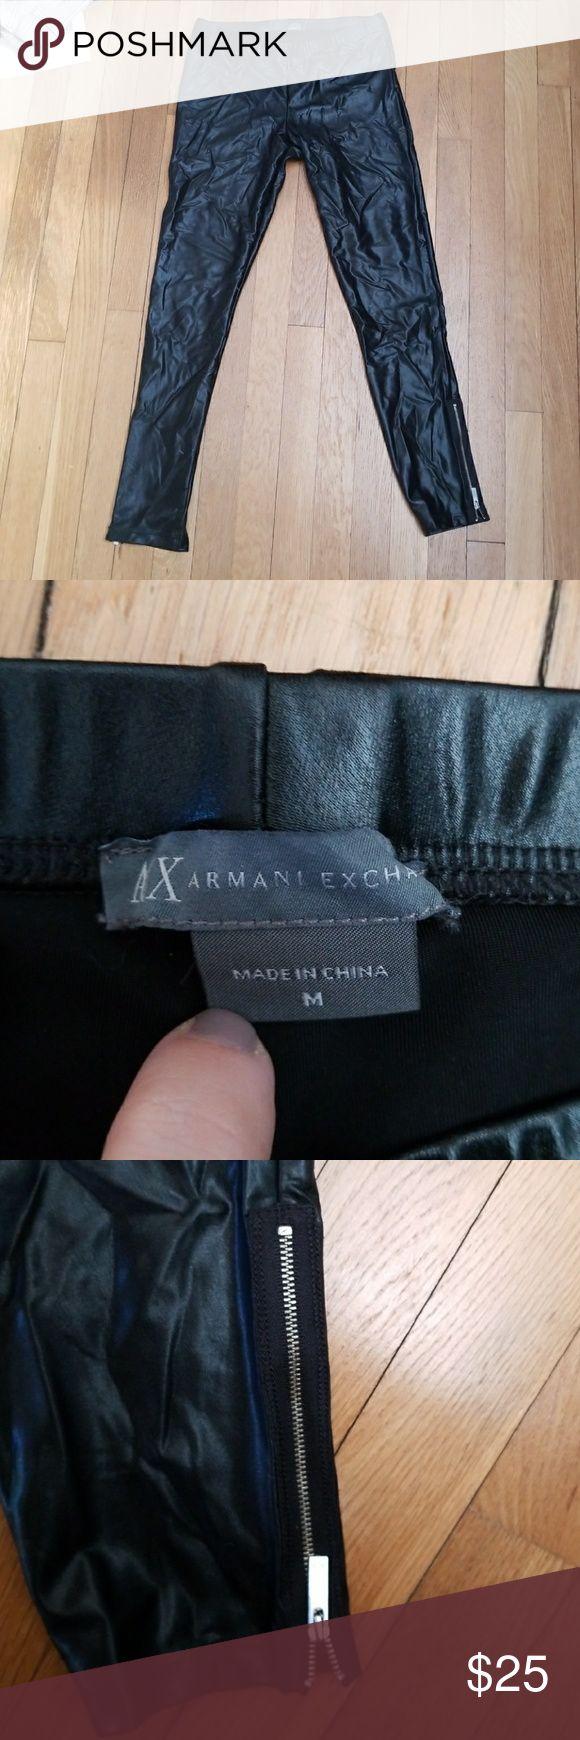 Armani exchange faux leather liquid zip leggings Faux leather look, worn once. Armani Exchange Pants Leggings